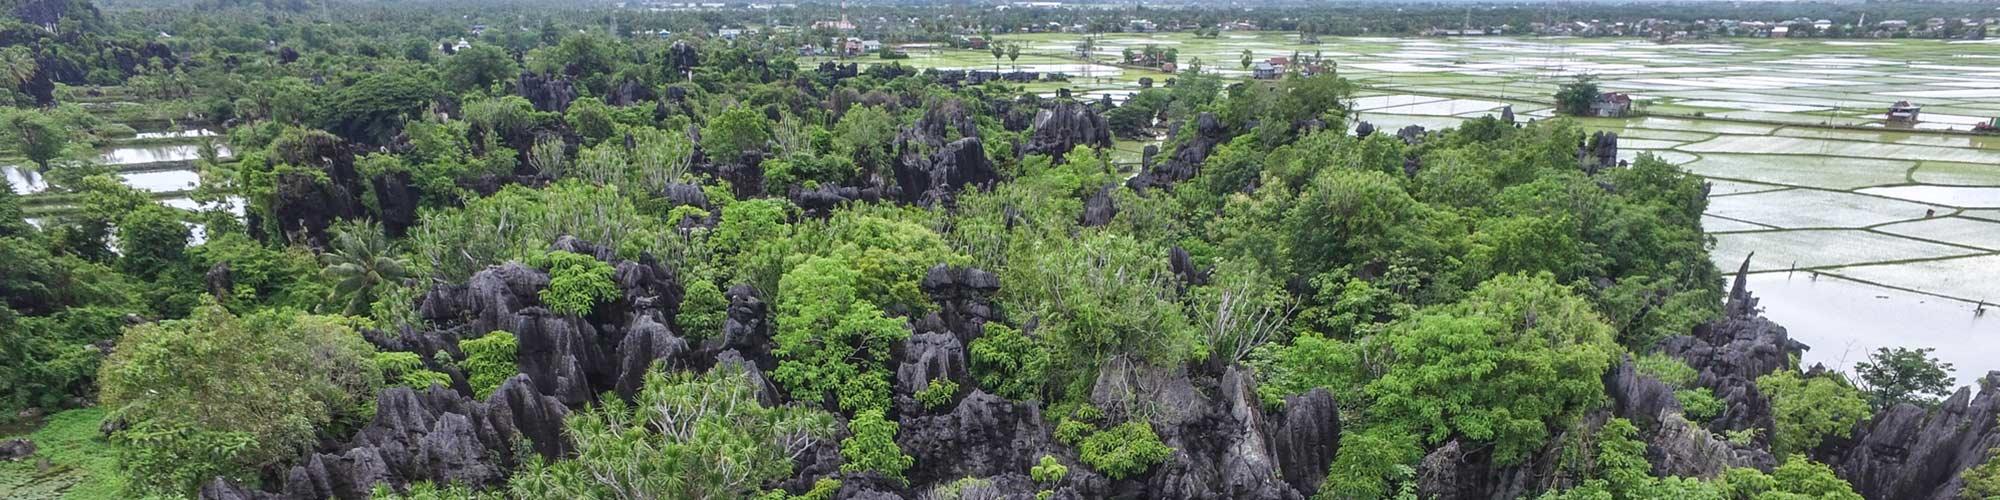 Rammang Rammang la isla de Sulawesi - El Pais Viajes